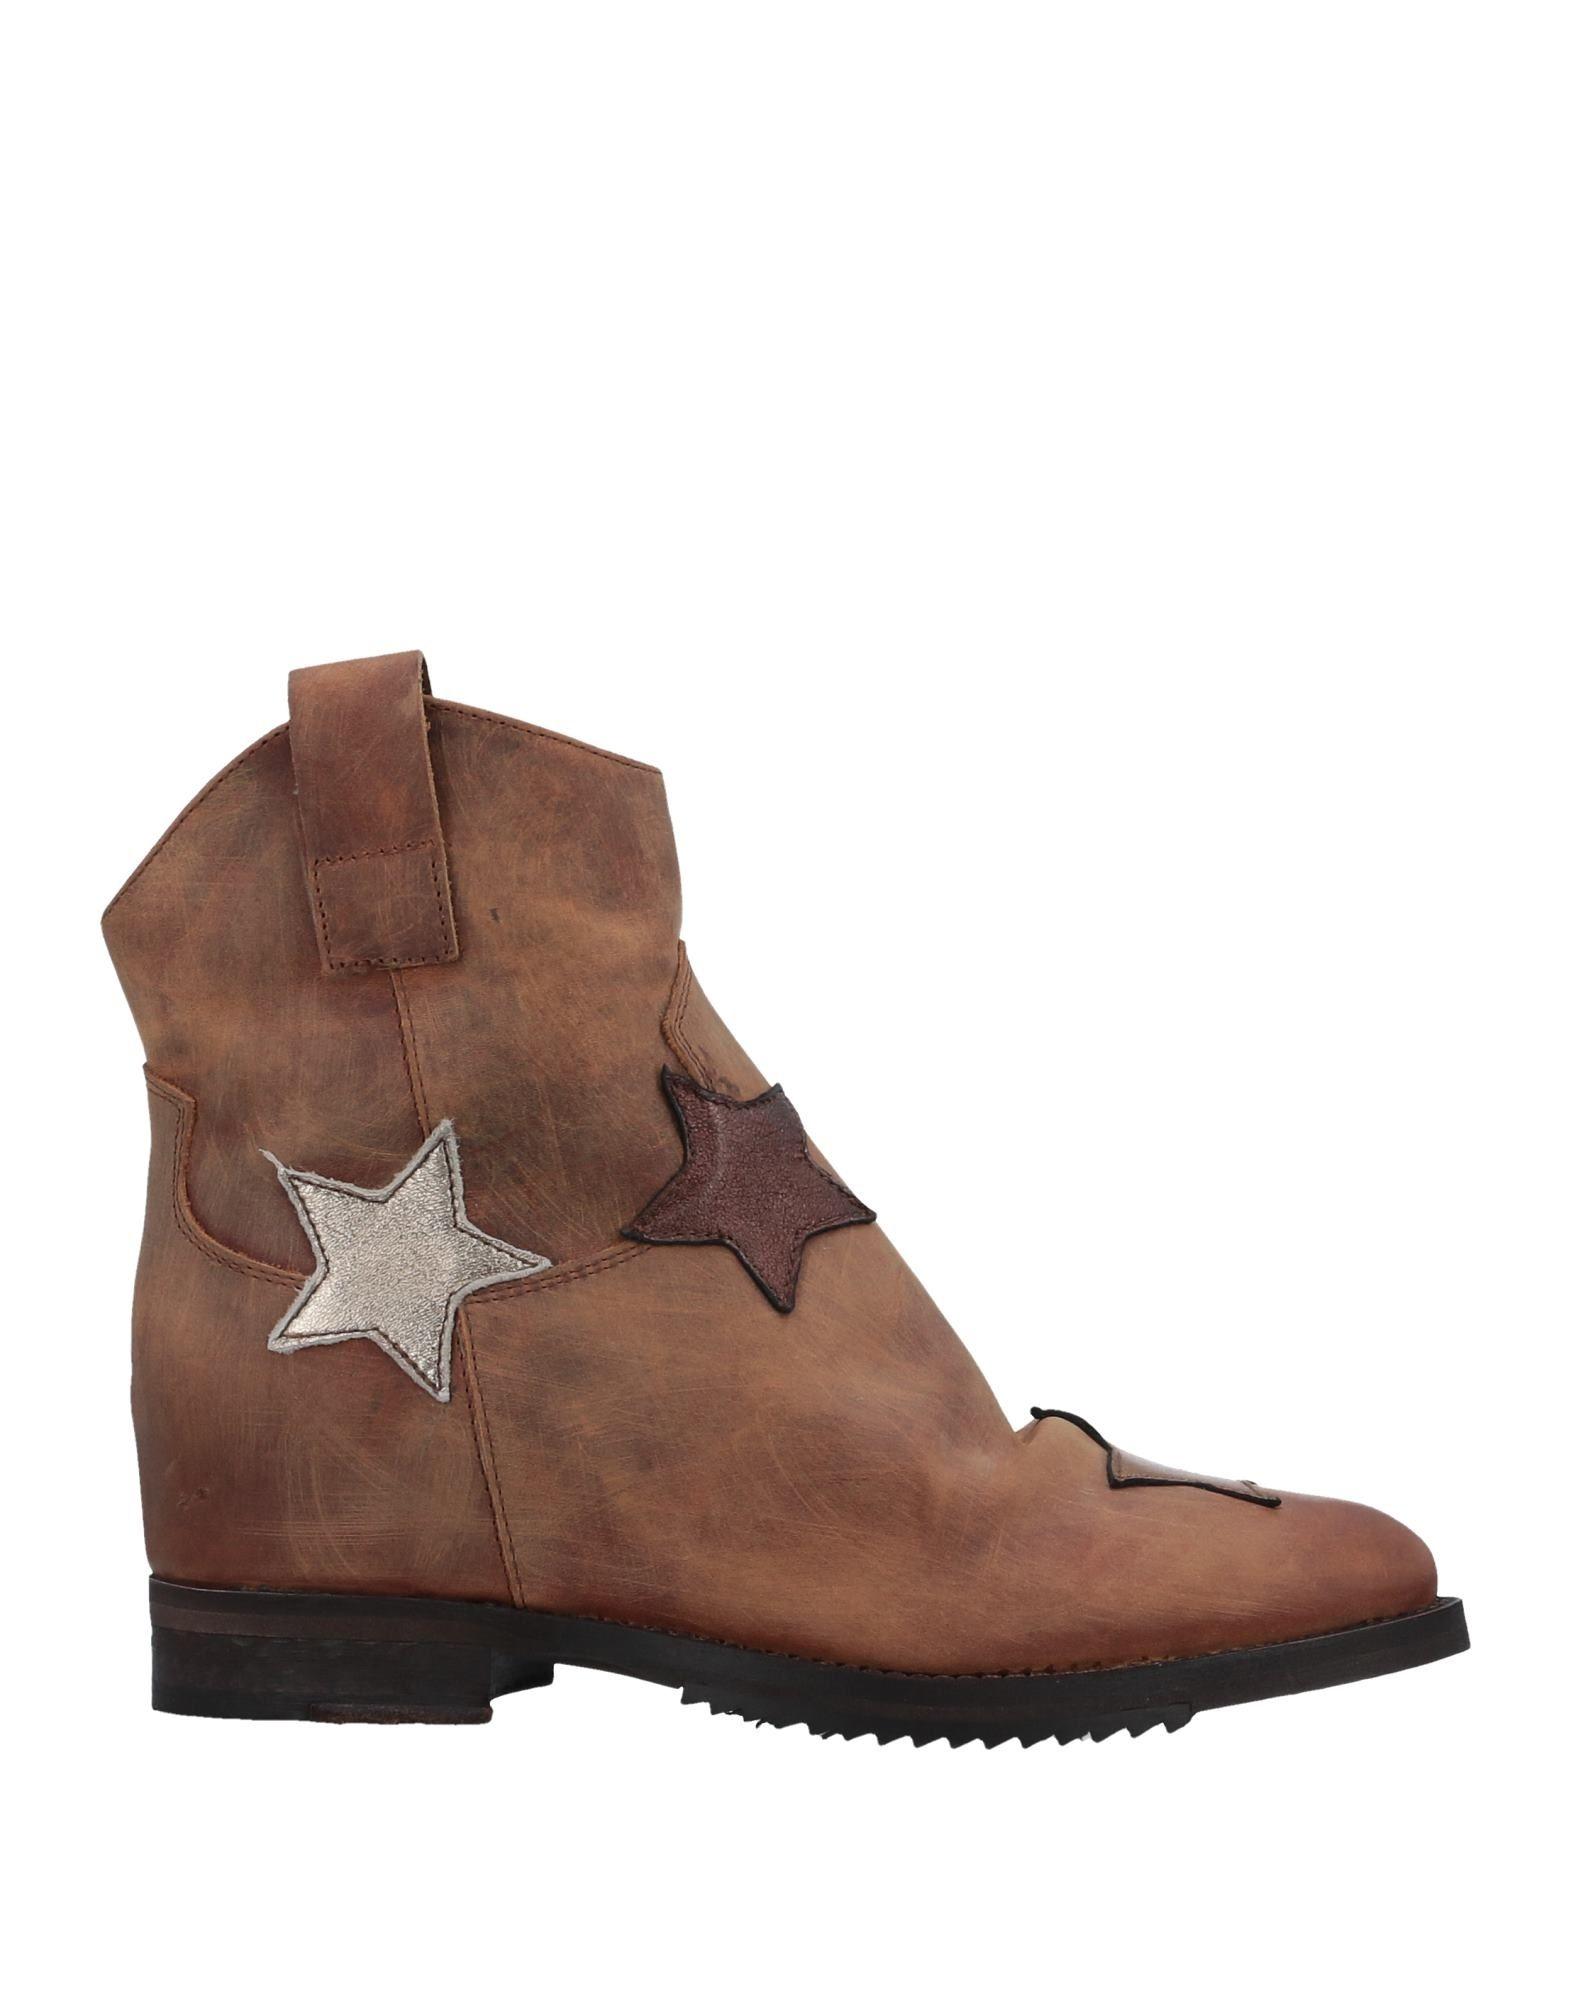 J D Julie Dee Ankle Boot - Women J D Julie Dee  Ankle Boots online on  Dee United Kingdom - 11508242JA 3475d6